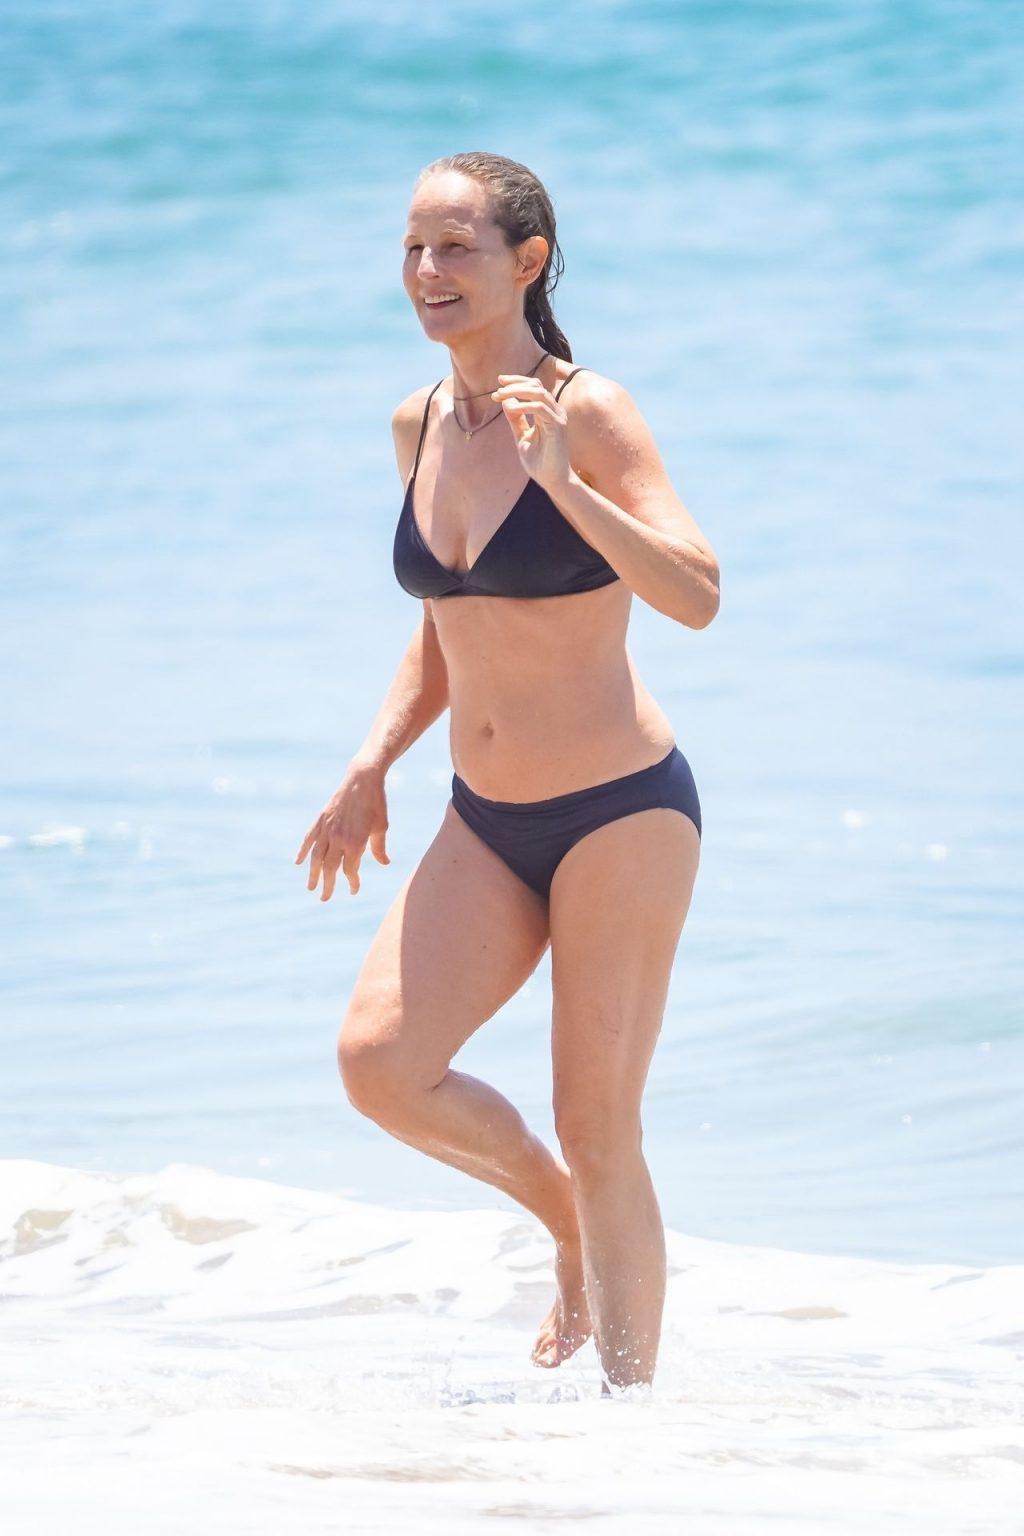 Helen Hunt Shows Off Her Bikini Body in Malibu (43 Photos)